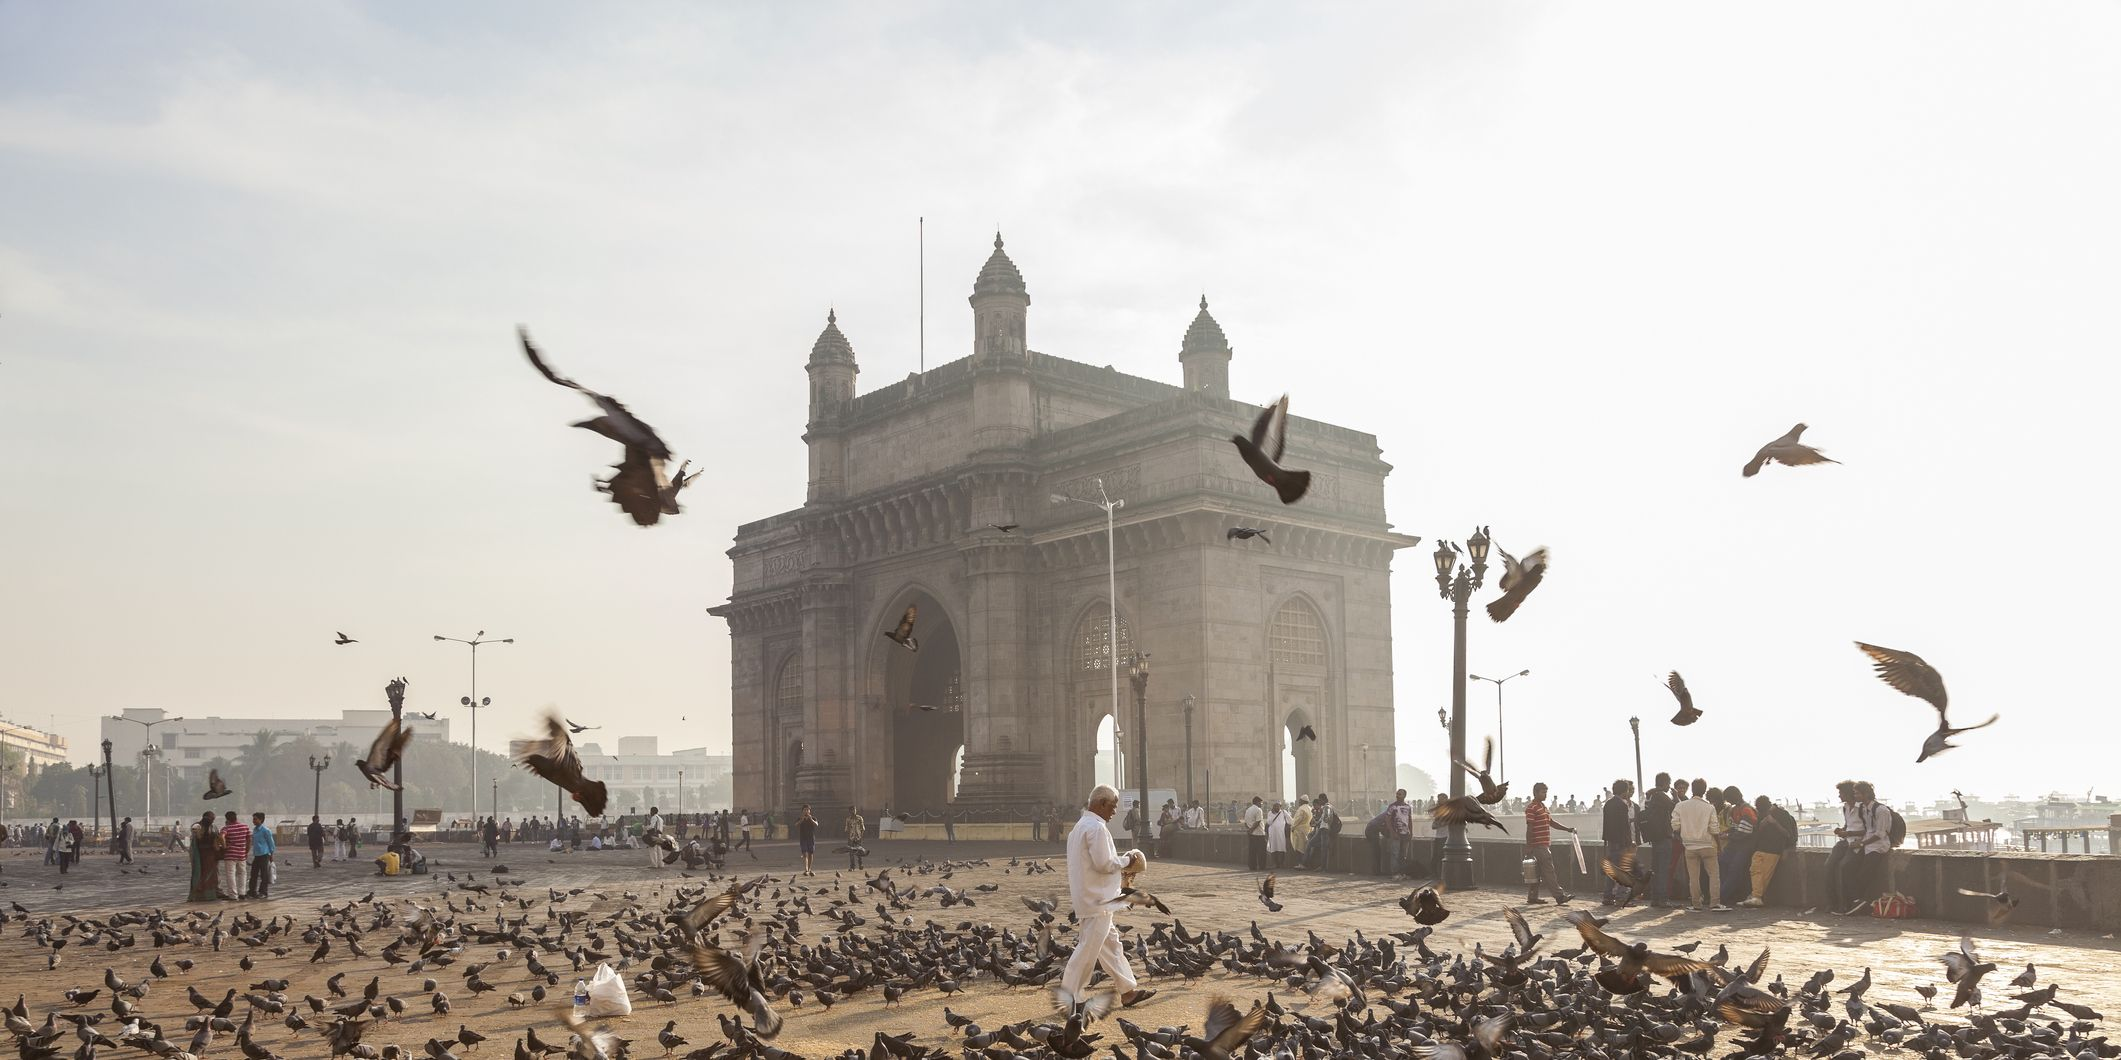 Pigeons, India Gate, Colaba, Mumbai, India